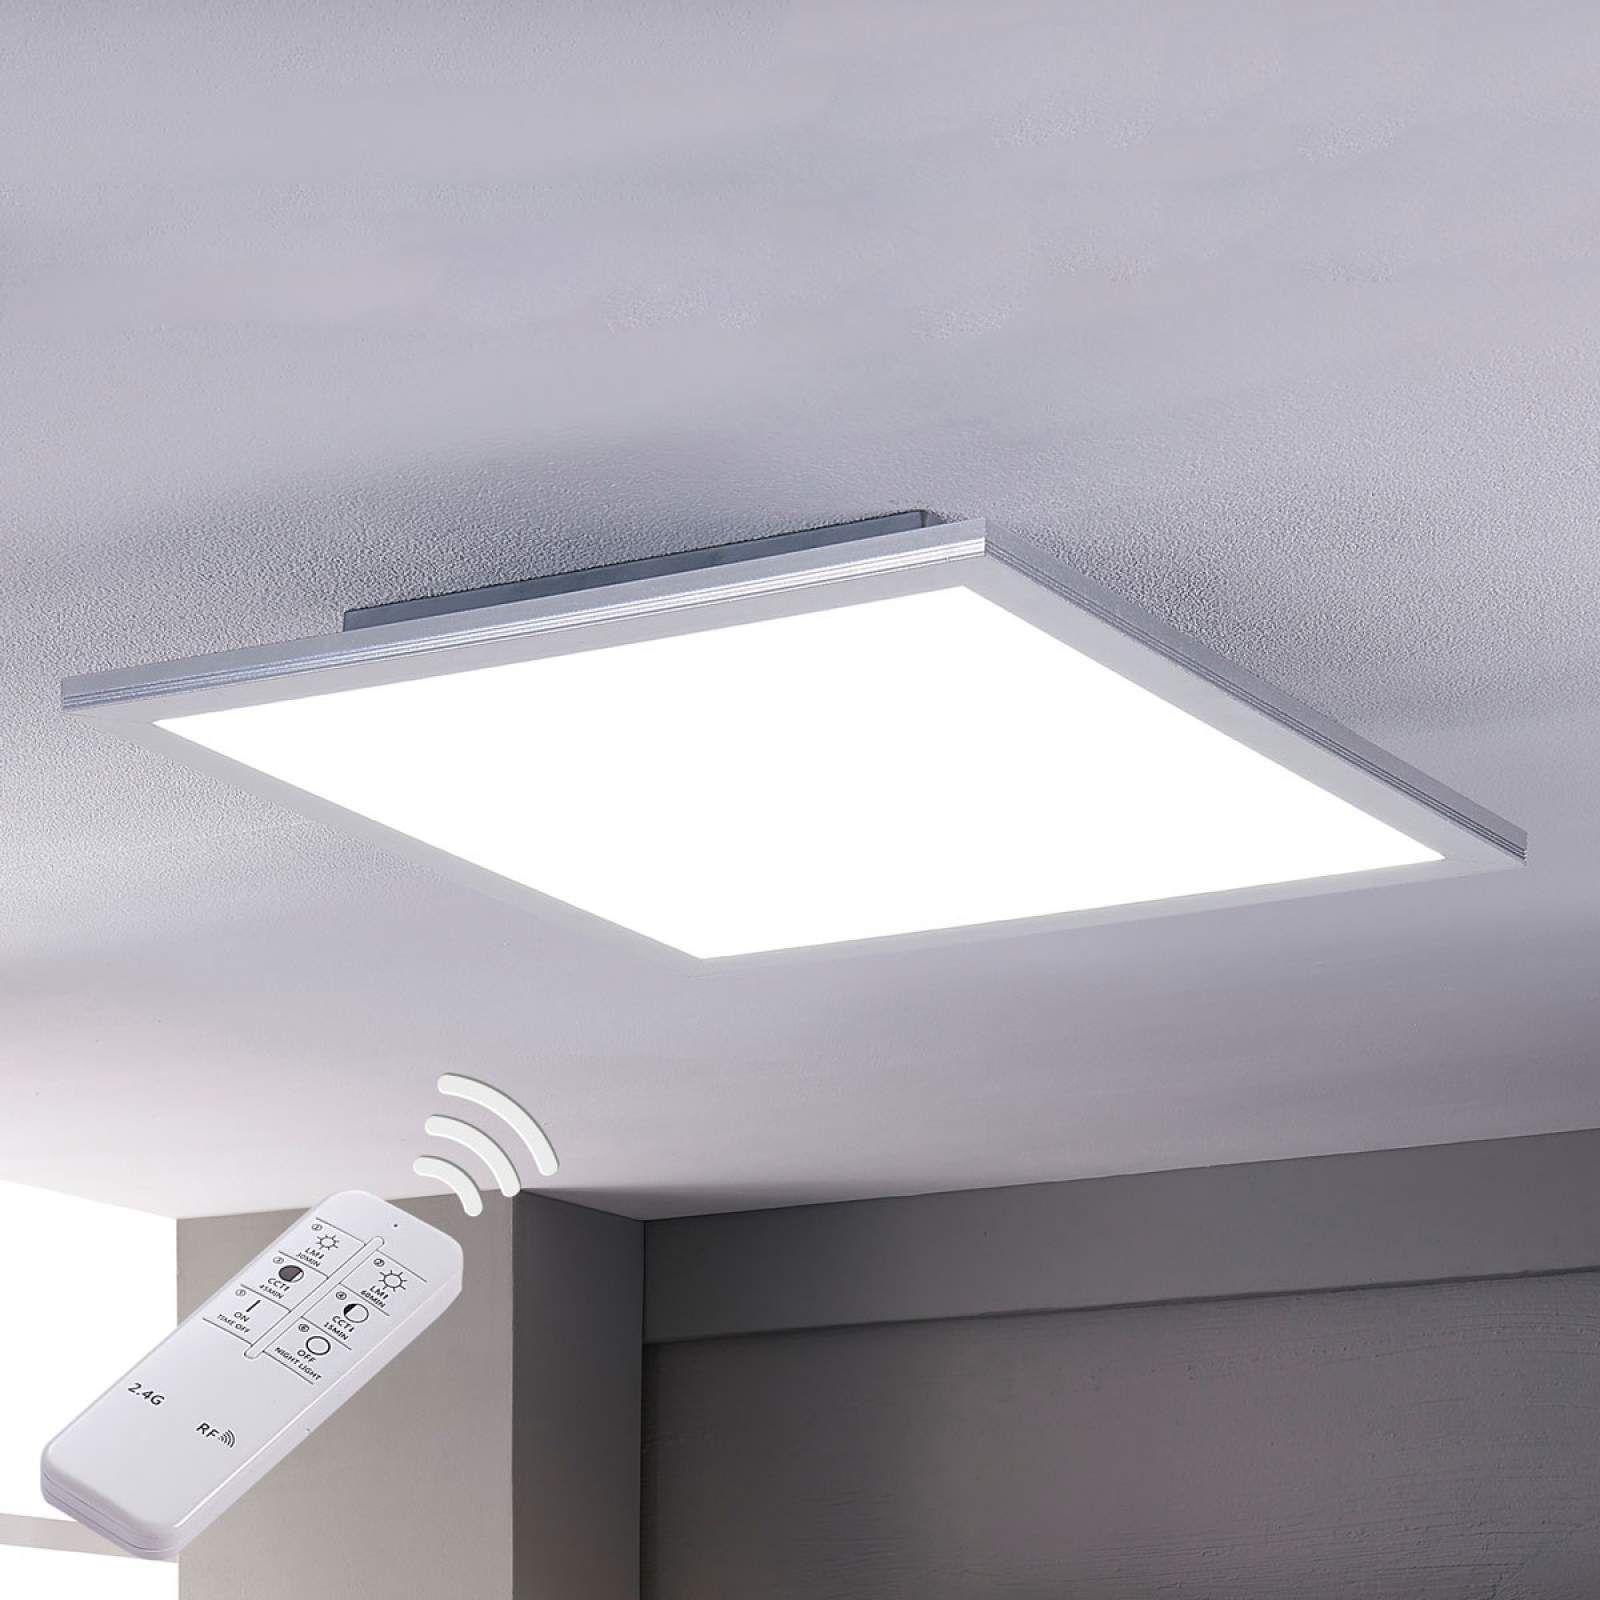 Lindby Livel Led Panel Cct 62 Cm X 62 Cm In 2020 Kuchenlampe Led Led Deckenlampen Und Deckenlampe Dimmbar